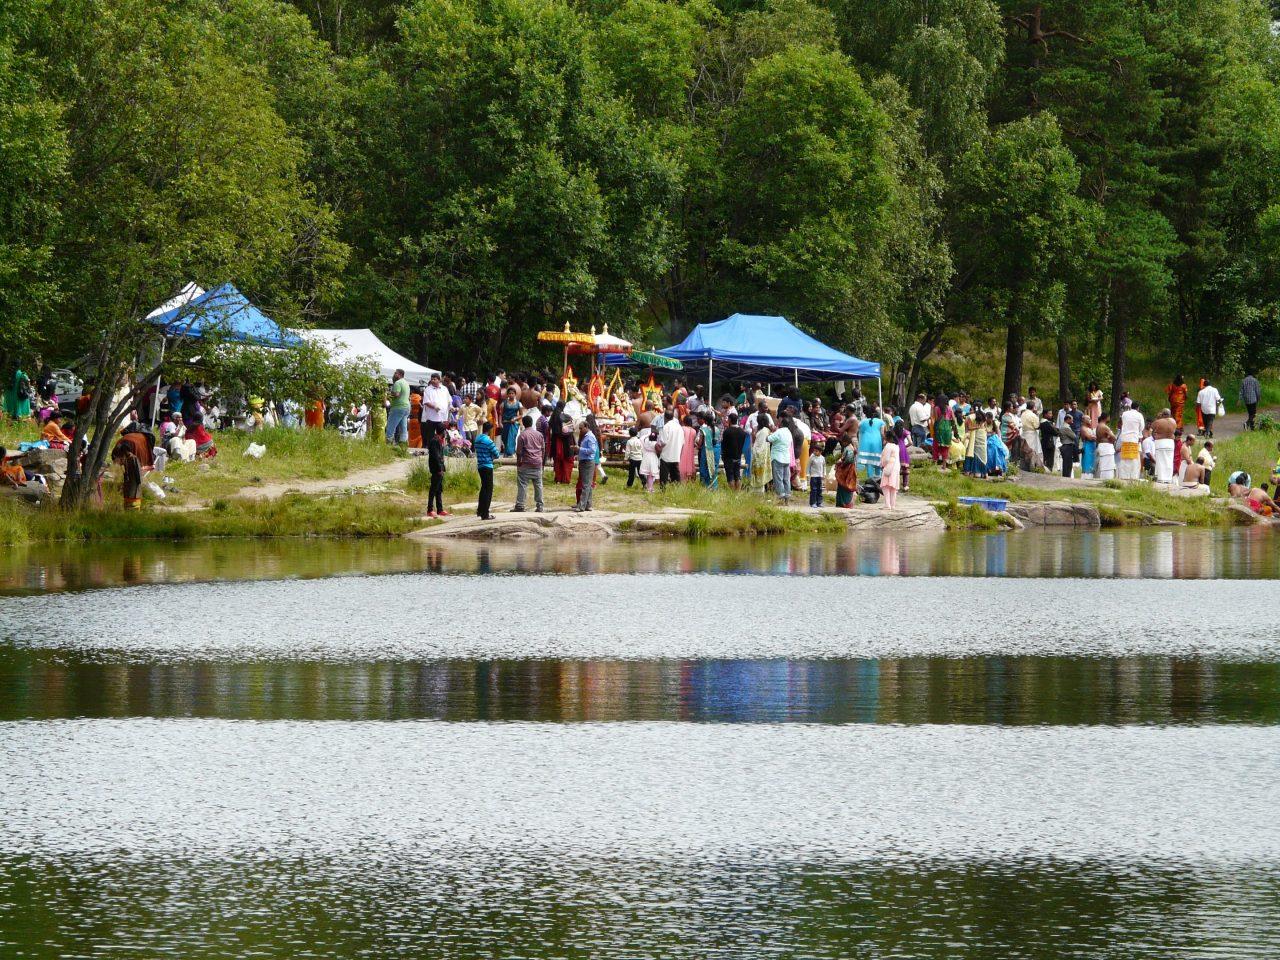 Norsk hindu kultursenter festival 2012